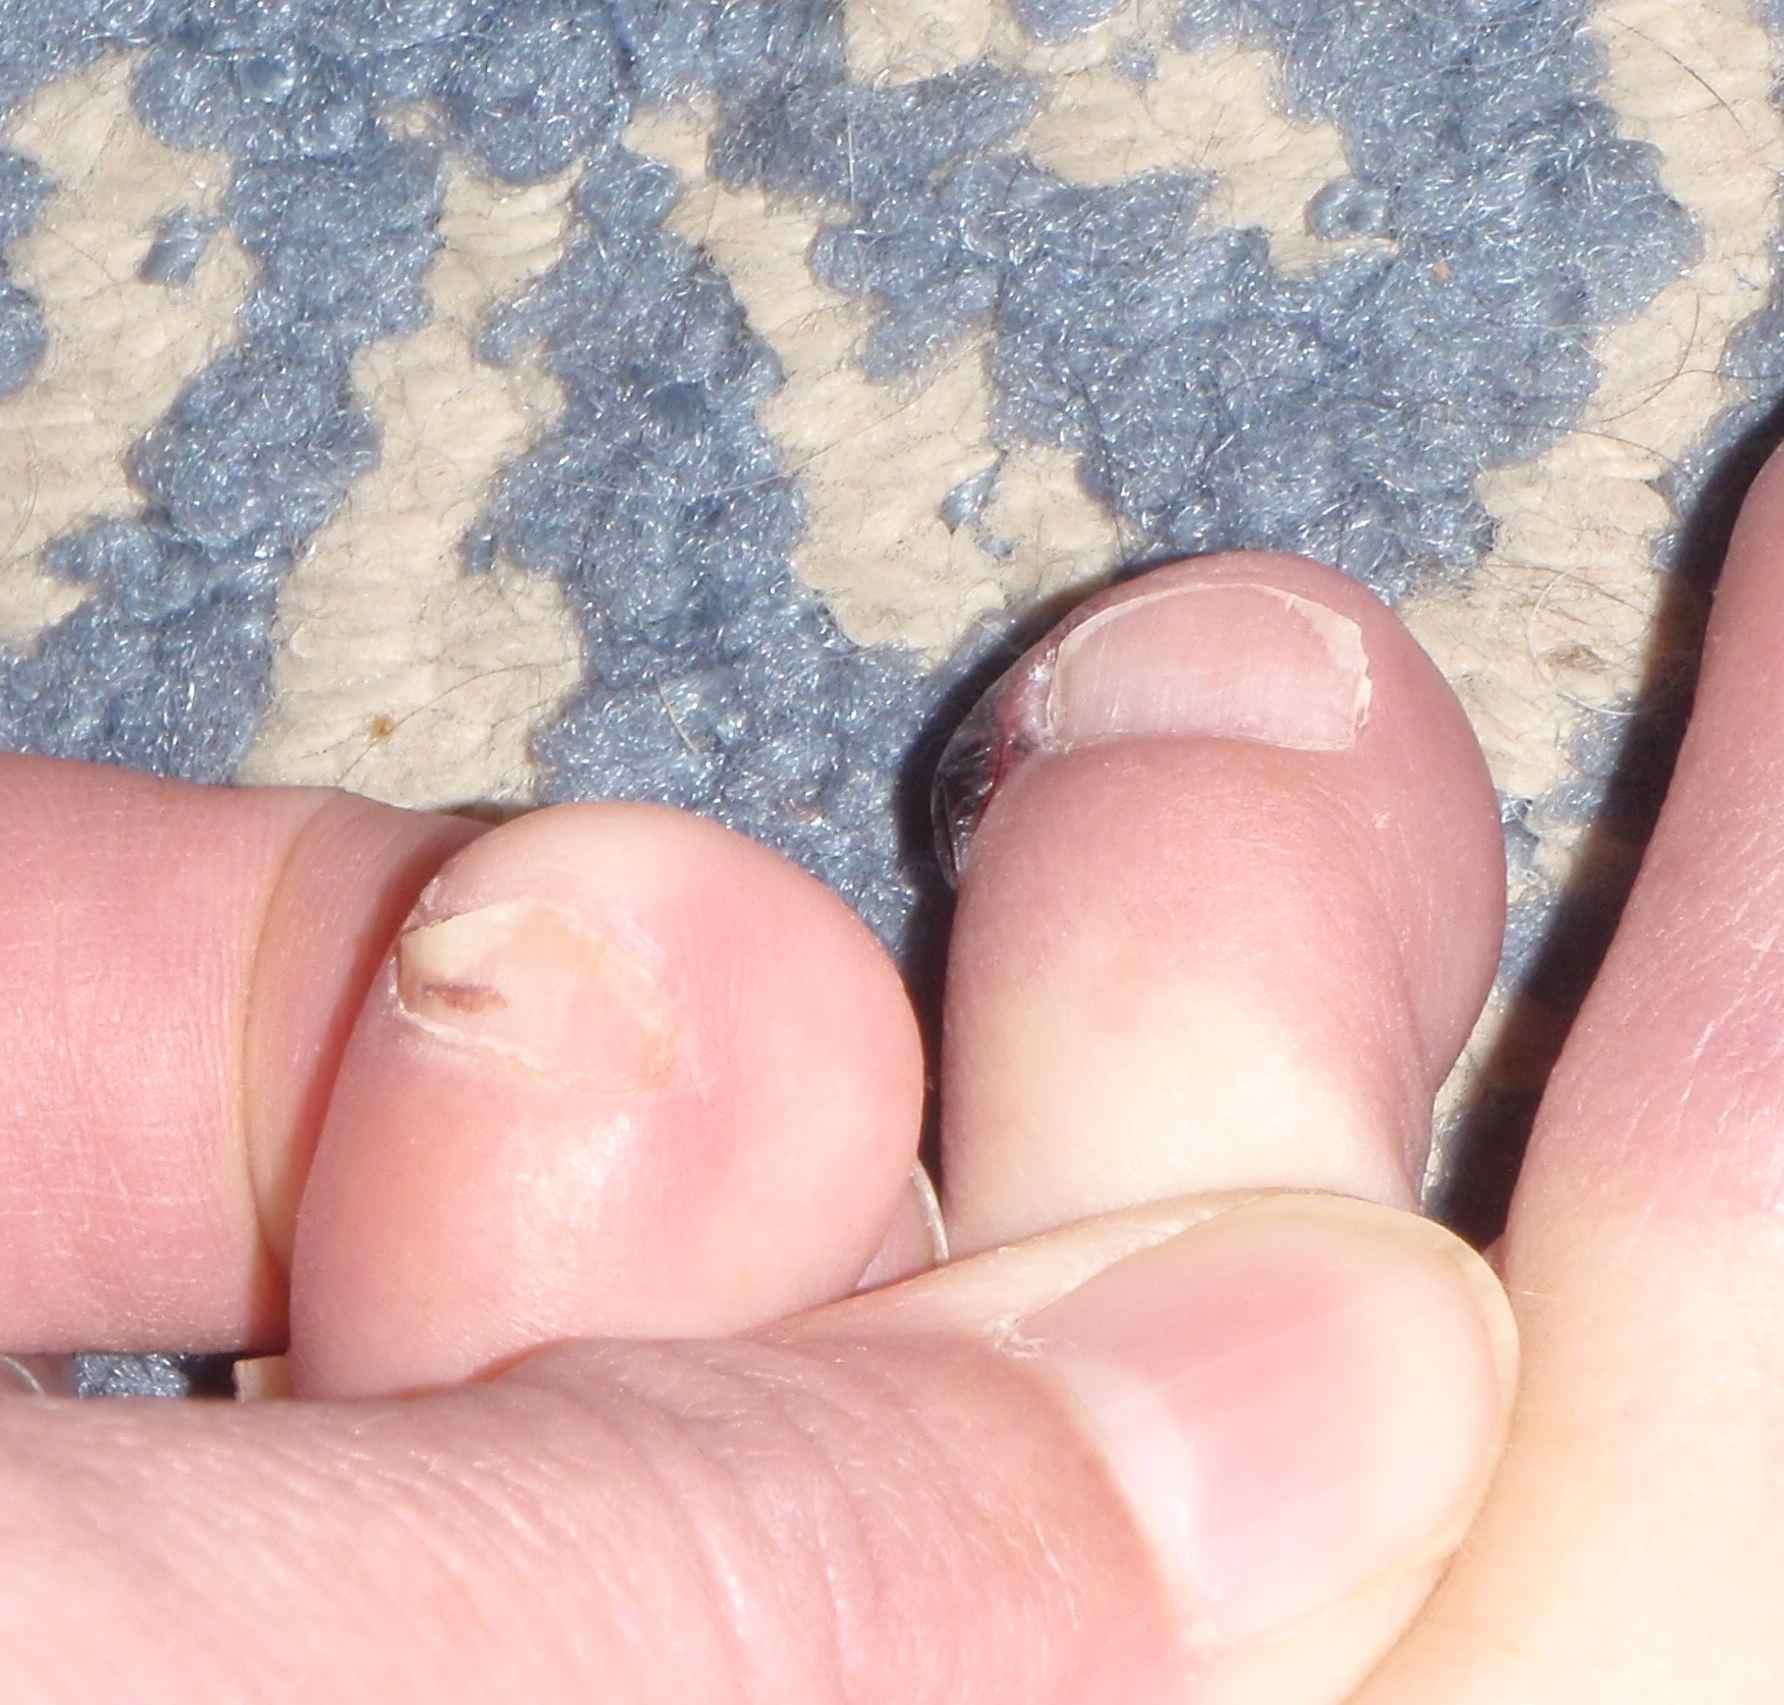 Toe Nail Fungus, Barefoot Running Blood Blisters, and Toe Socks